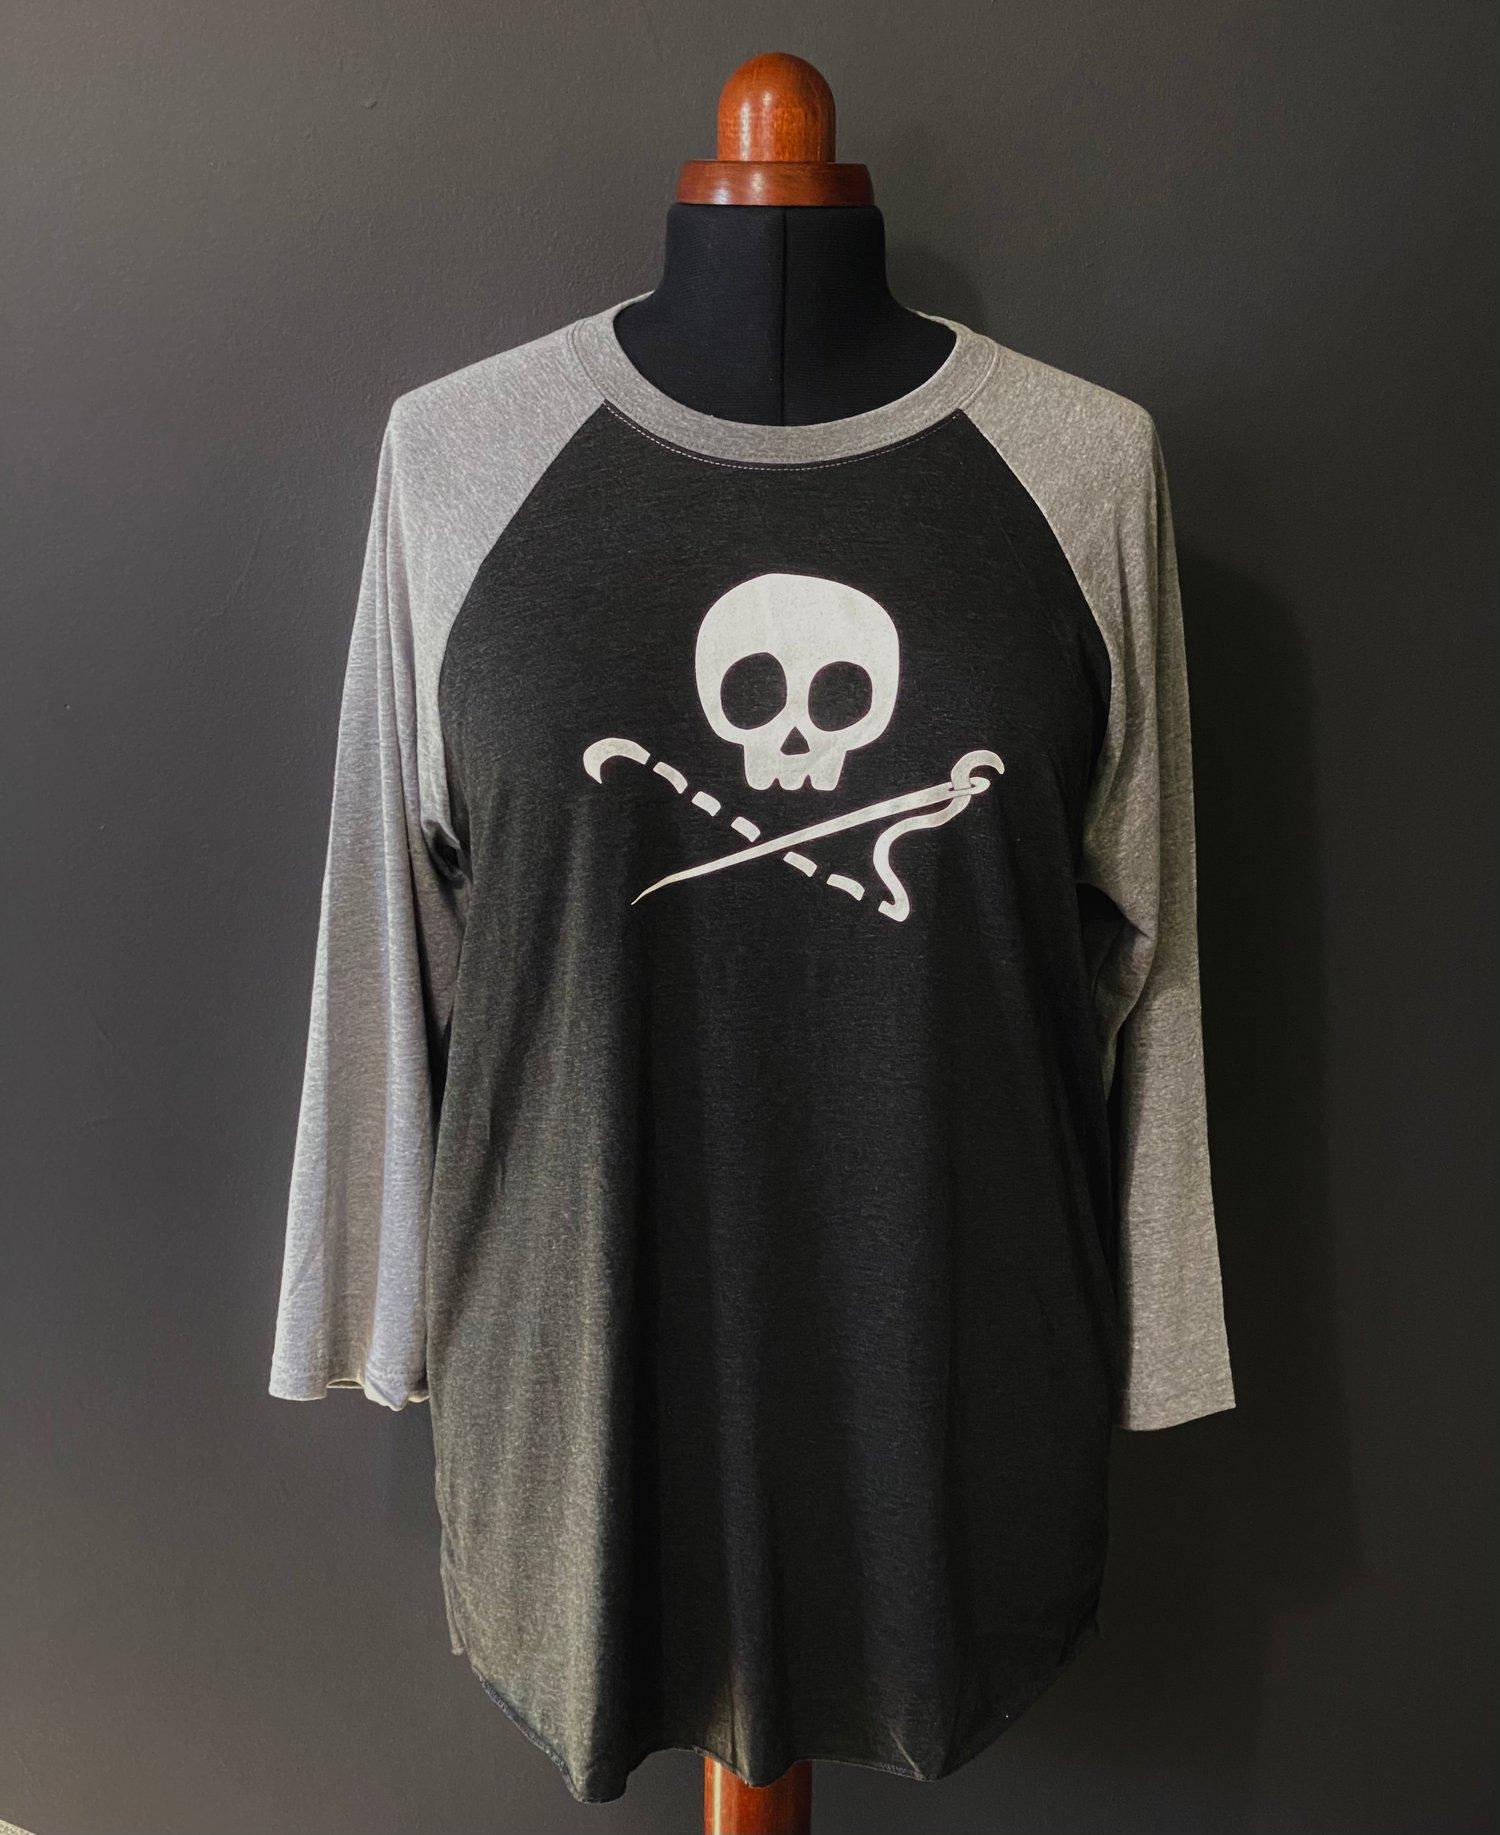 LIMITED EDITION Sewing Skull 3/4 Sleeve Baseball T Shirt